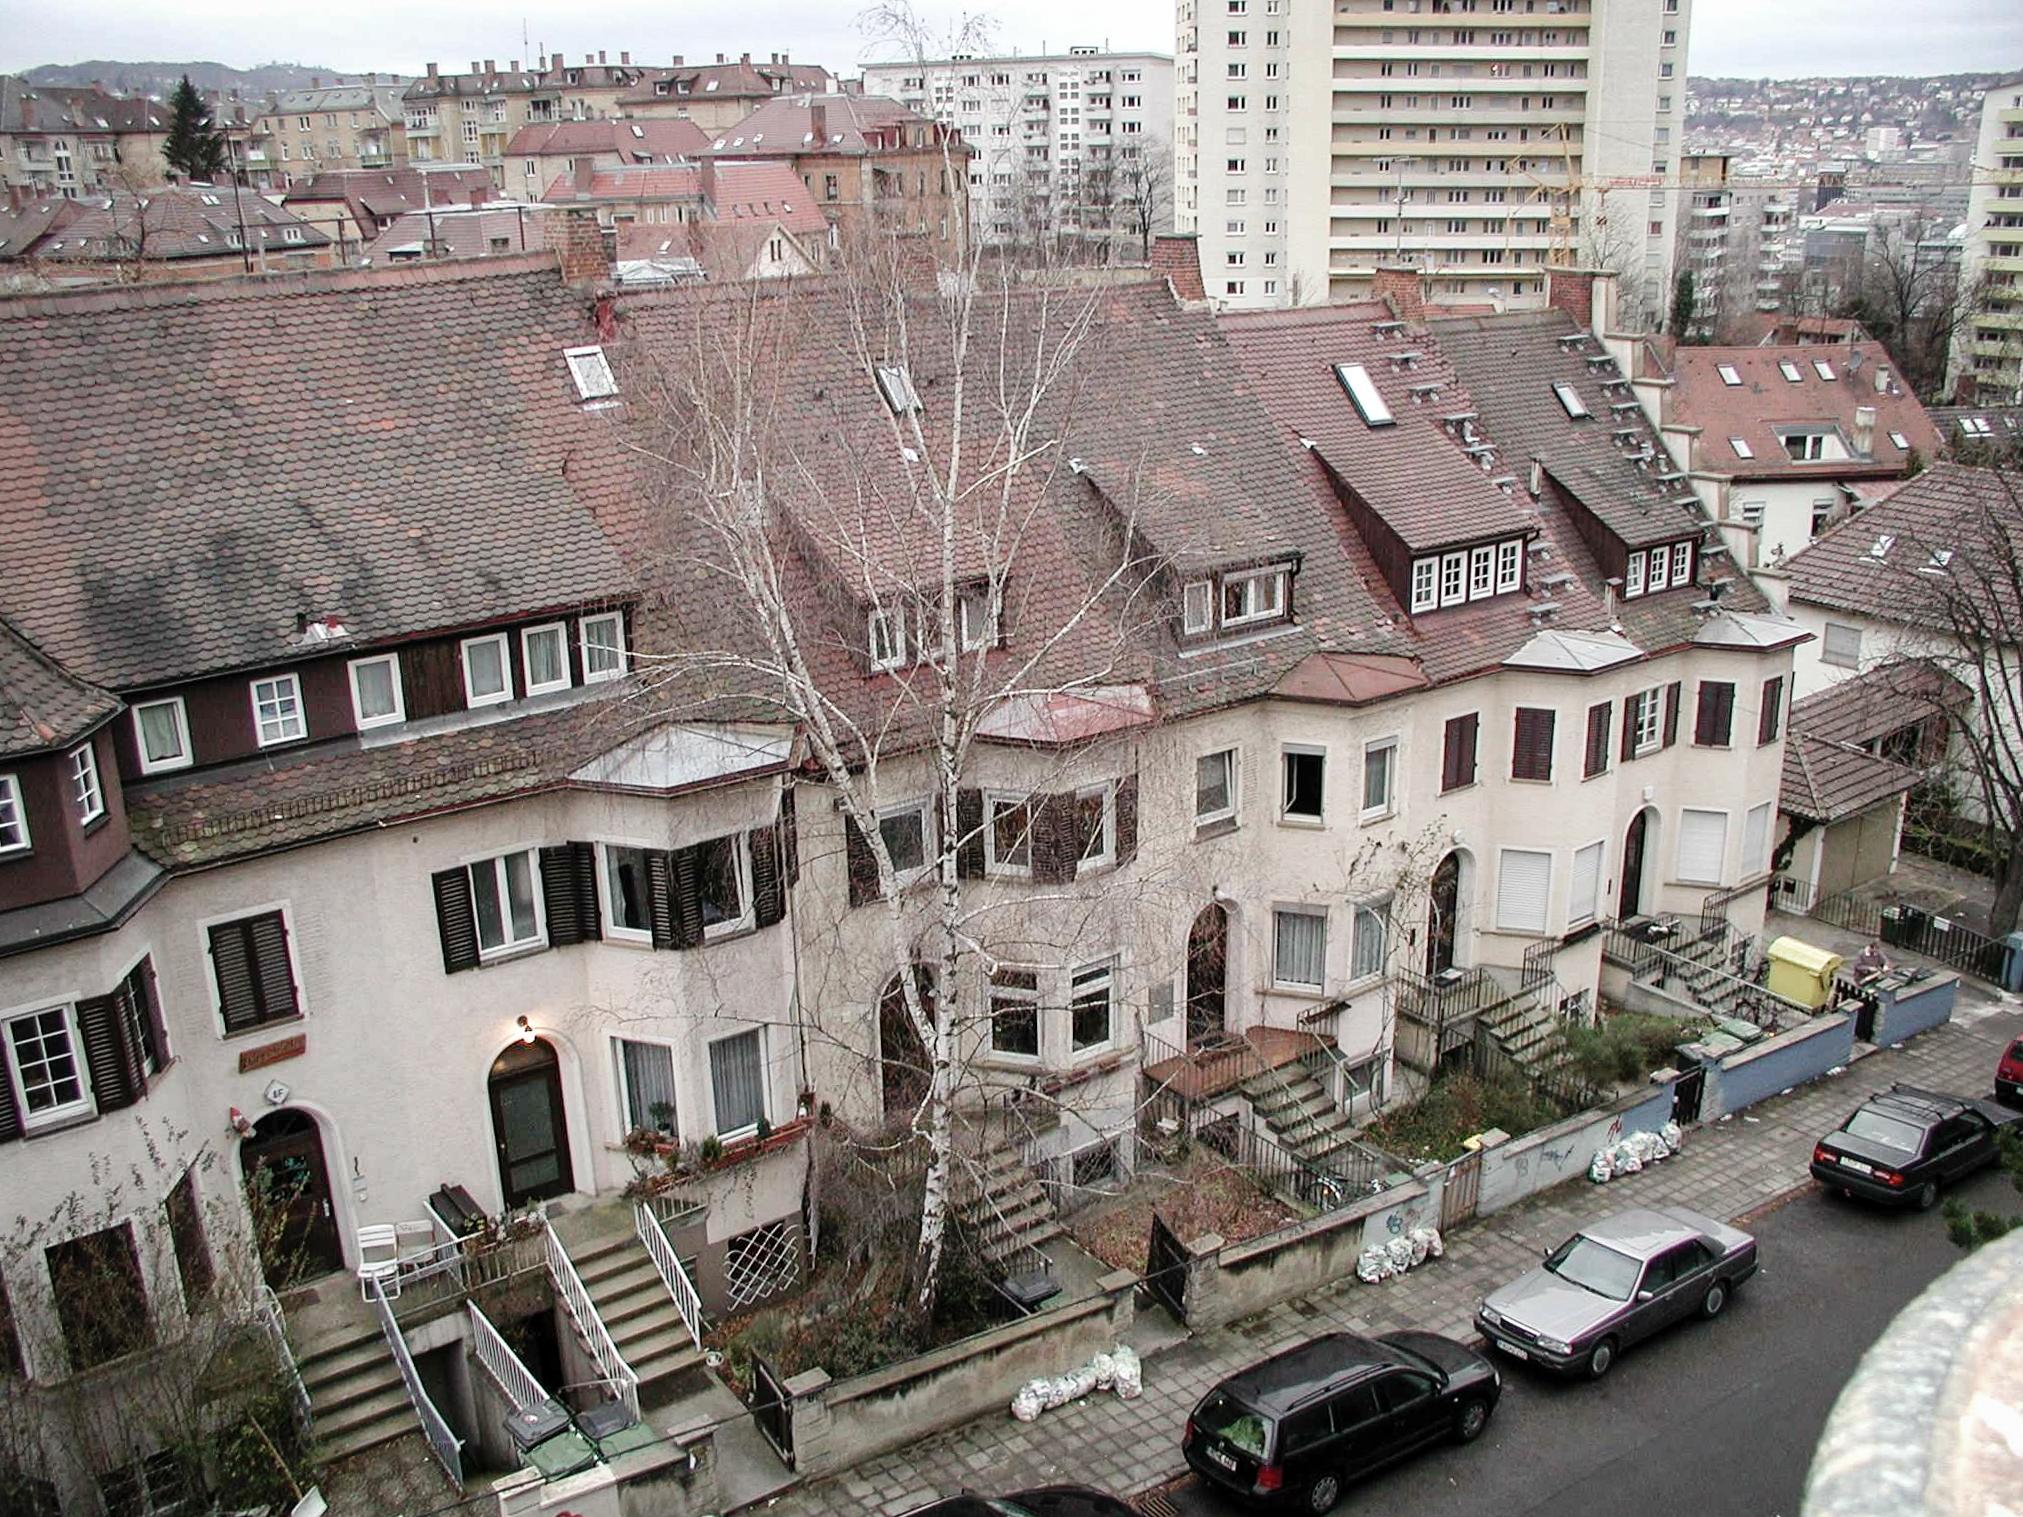 Knopp_Architekten_7.jpg